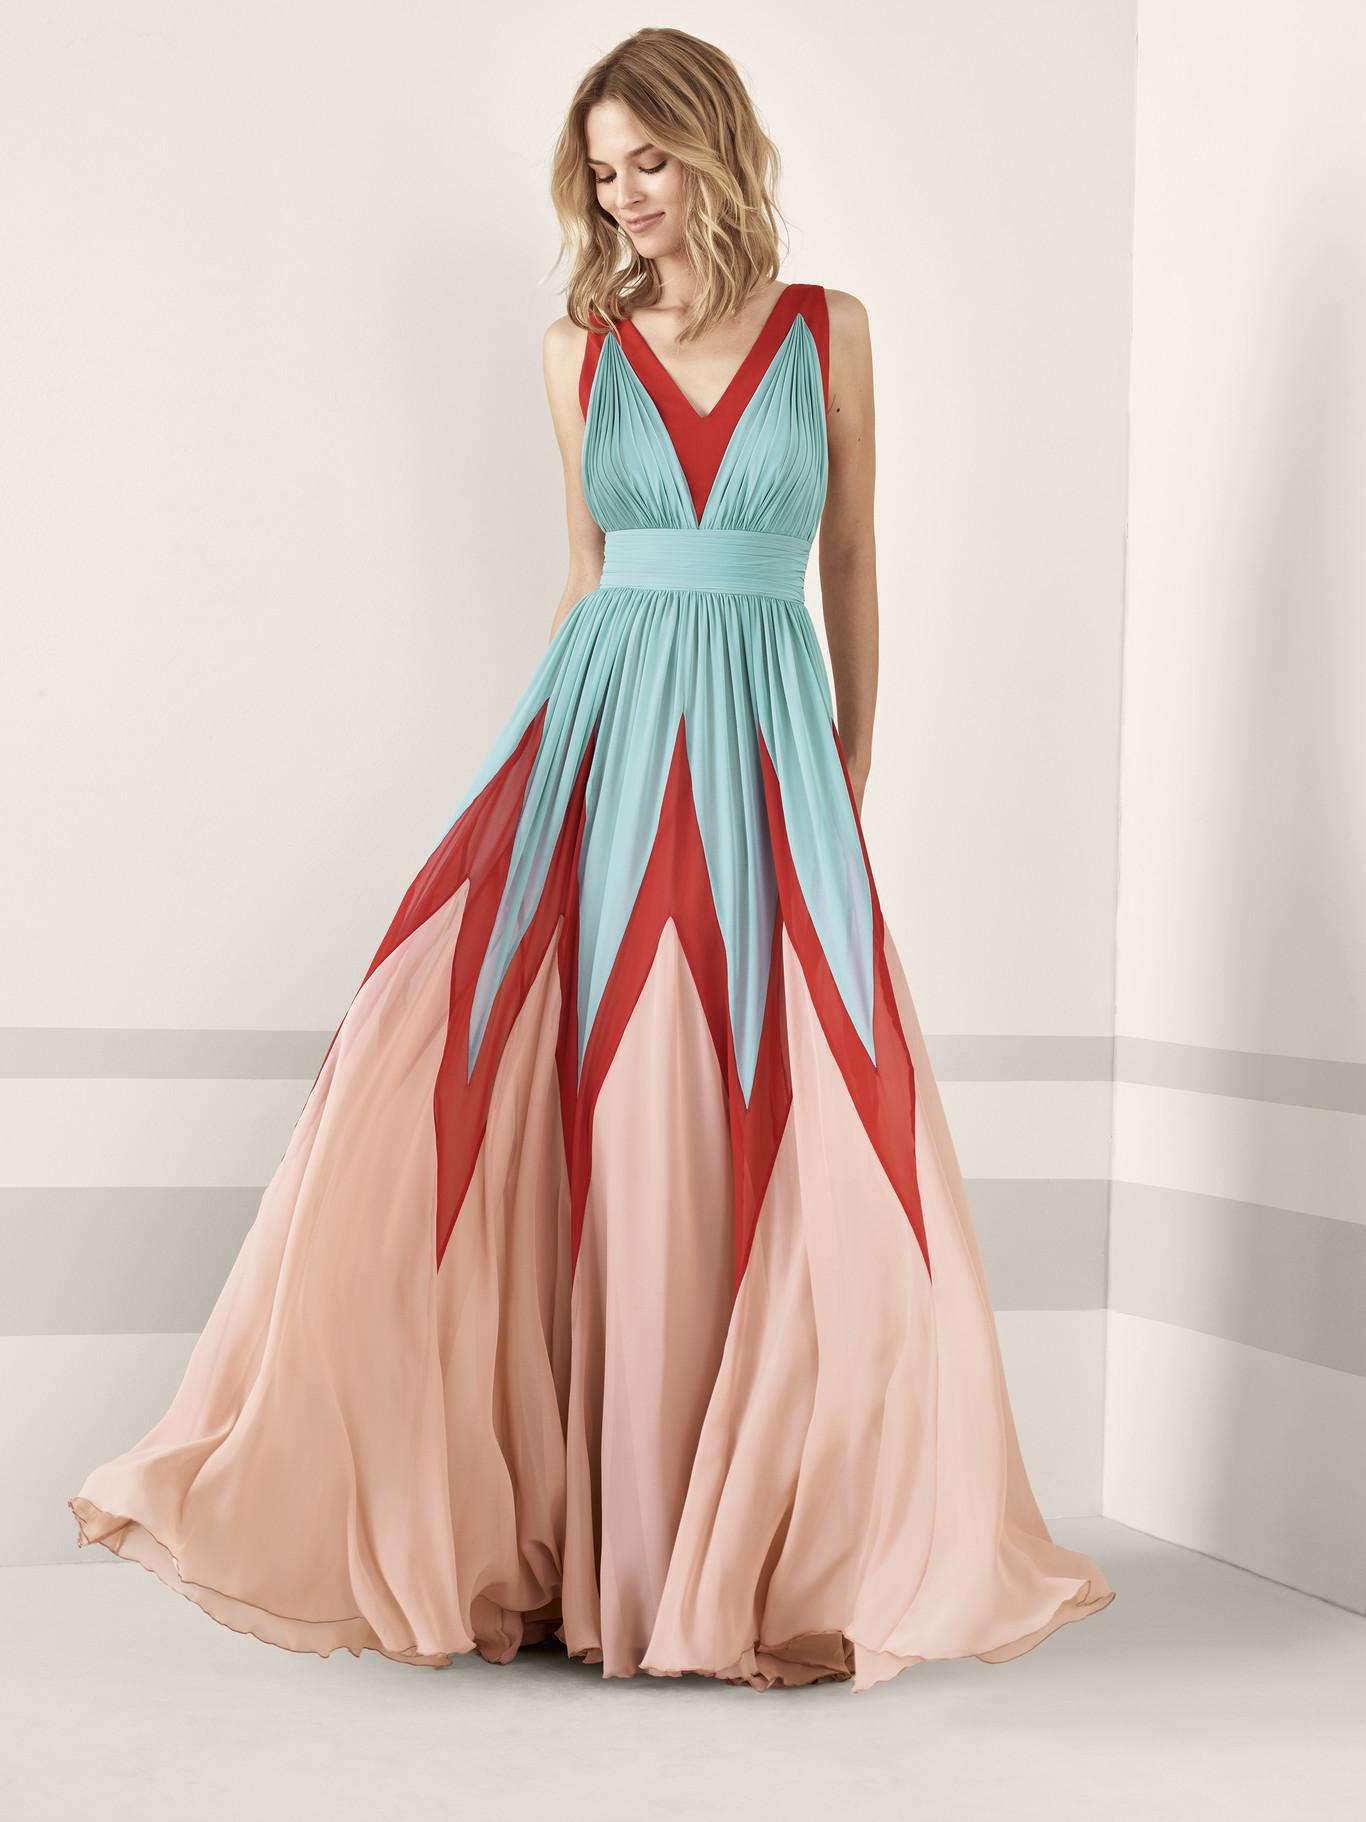 Vestidos para bodas de noche verano 2019